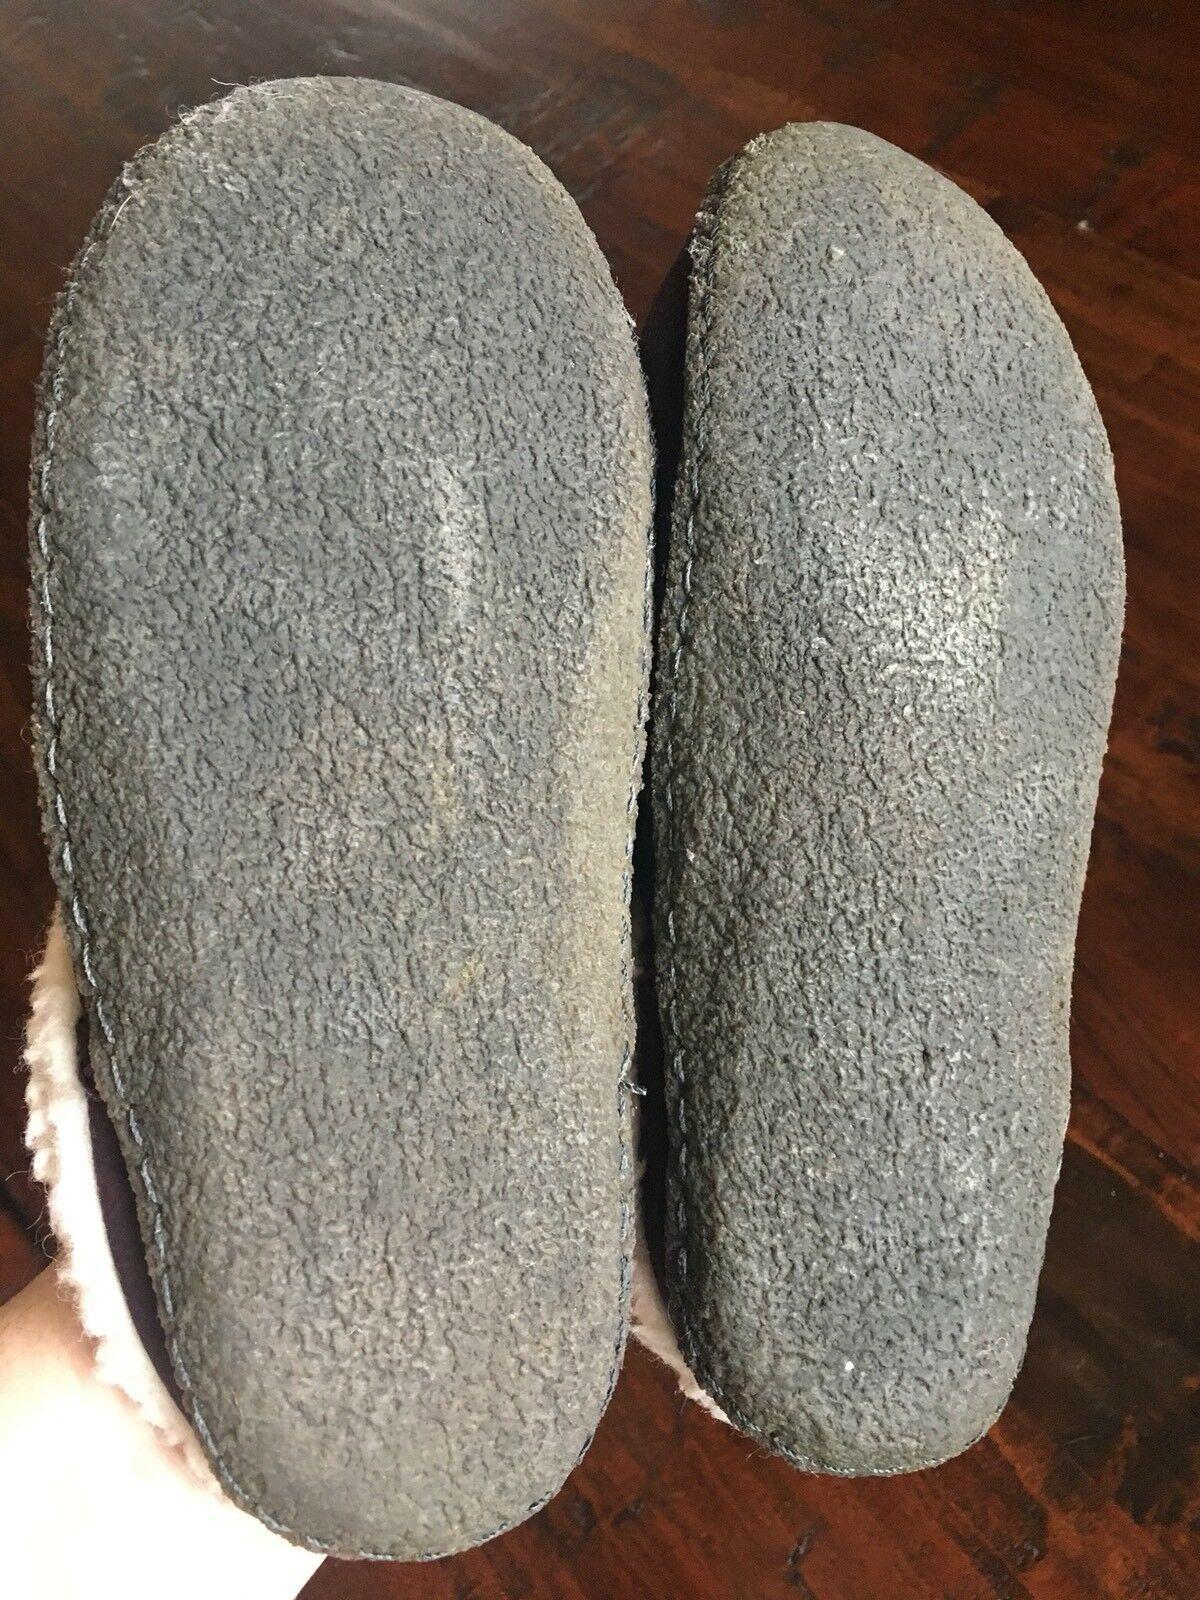 SOREL 9381 Womens Nakiska LILAC Purple Suede Clog Slippers Shoes 6 M #176 image 7